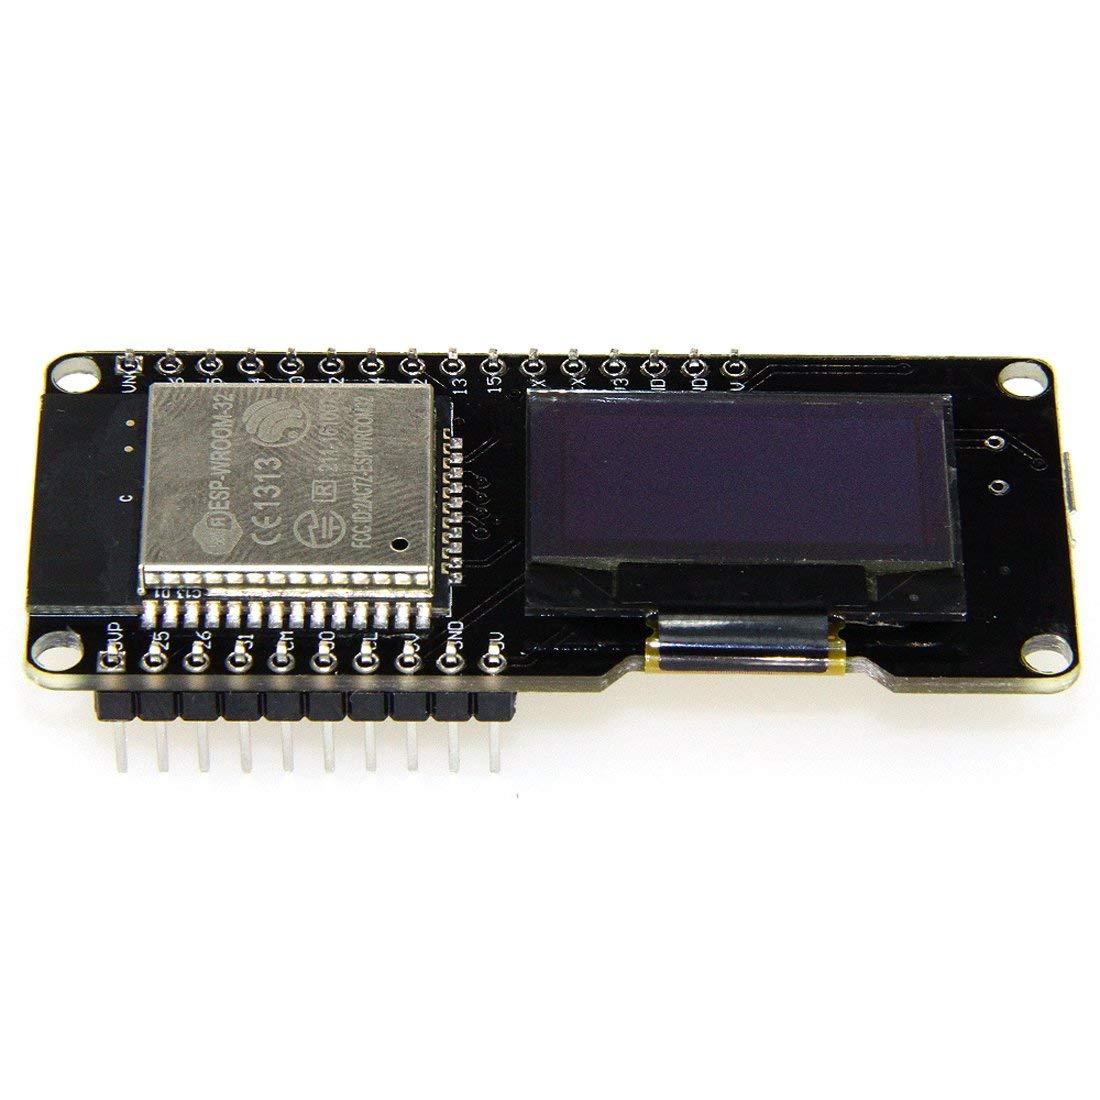 "ESP32 OLED Development Board 0.96"" OLED Display ESP-WROOM-32 ESP32 ESP-32 WIFI-BT for Arduino AP ST"